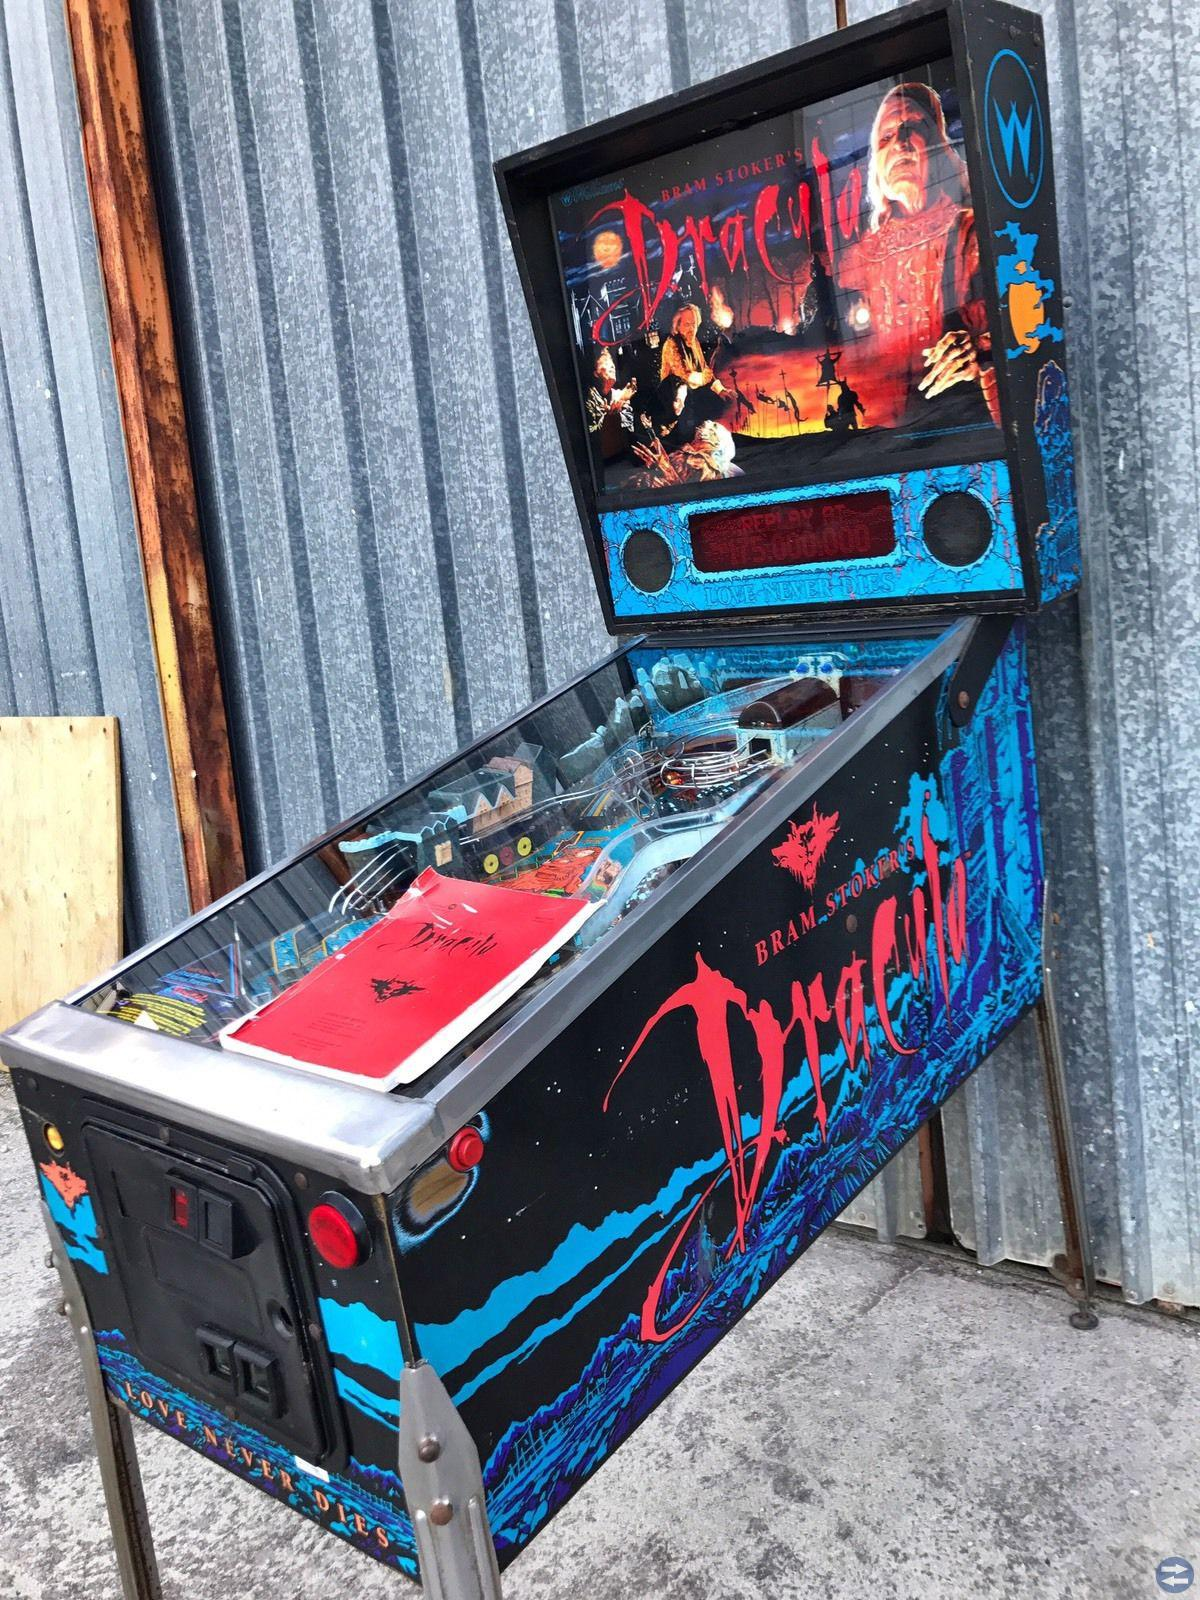 Dracula 1993 Pinball Flipper Williams Bram Stoker'